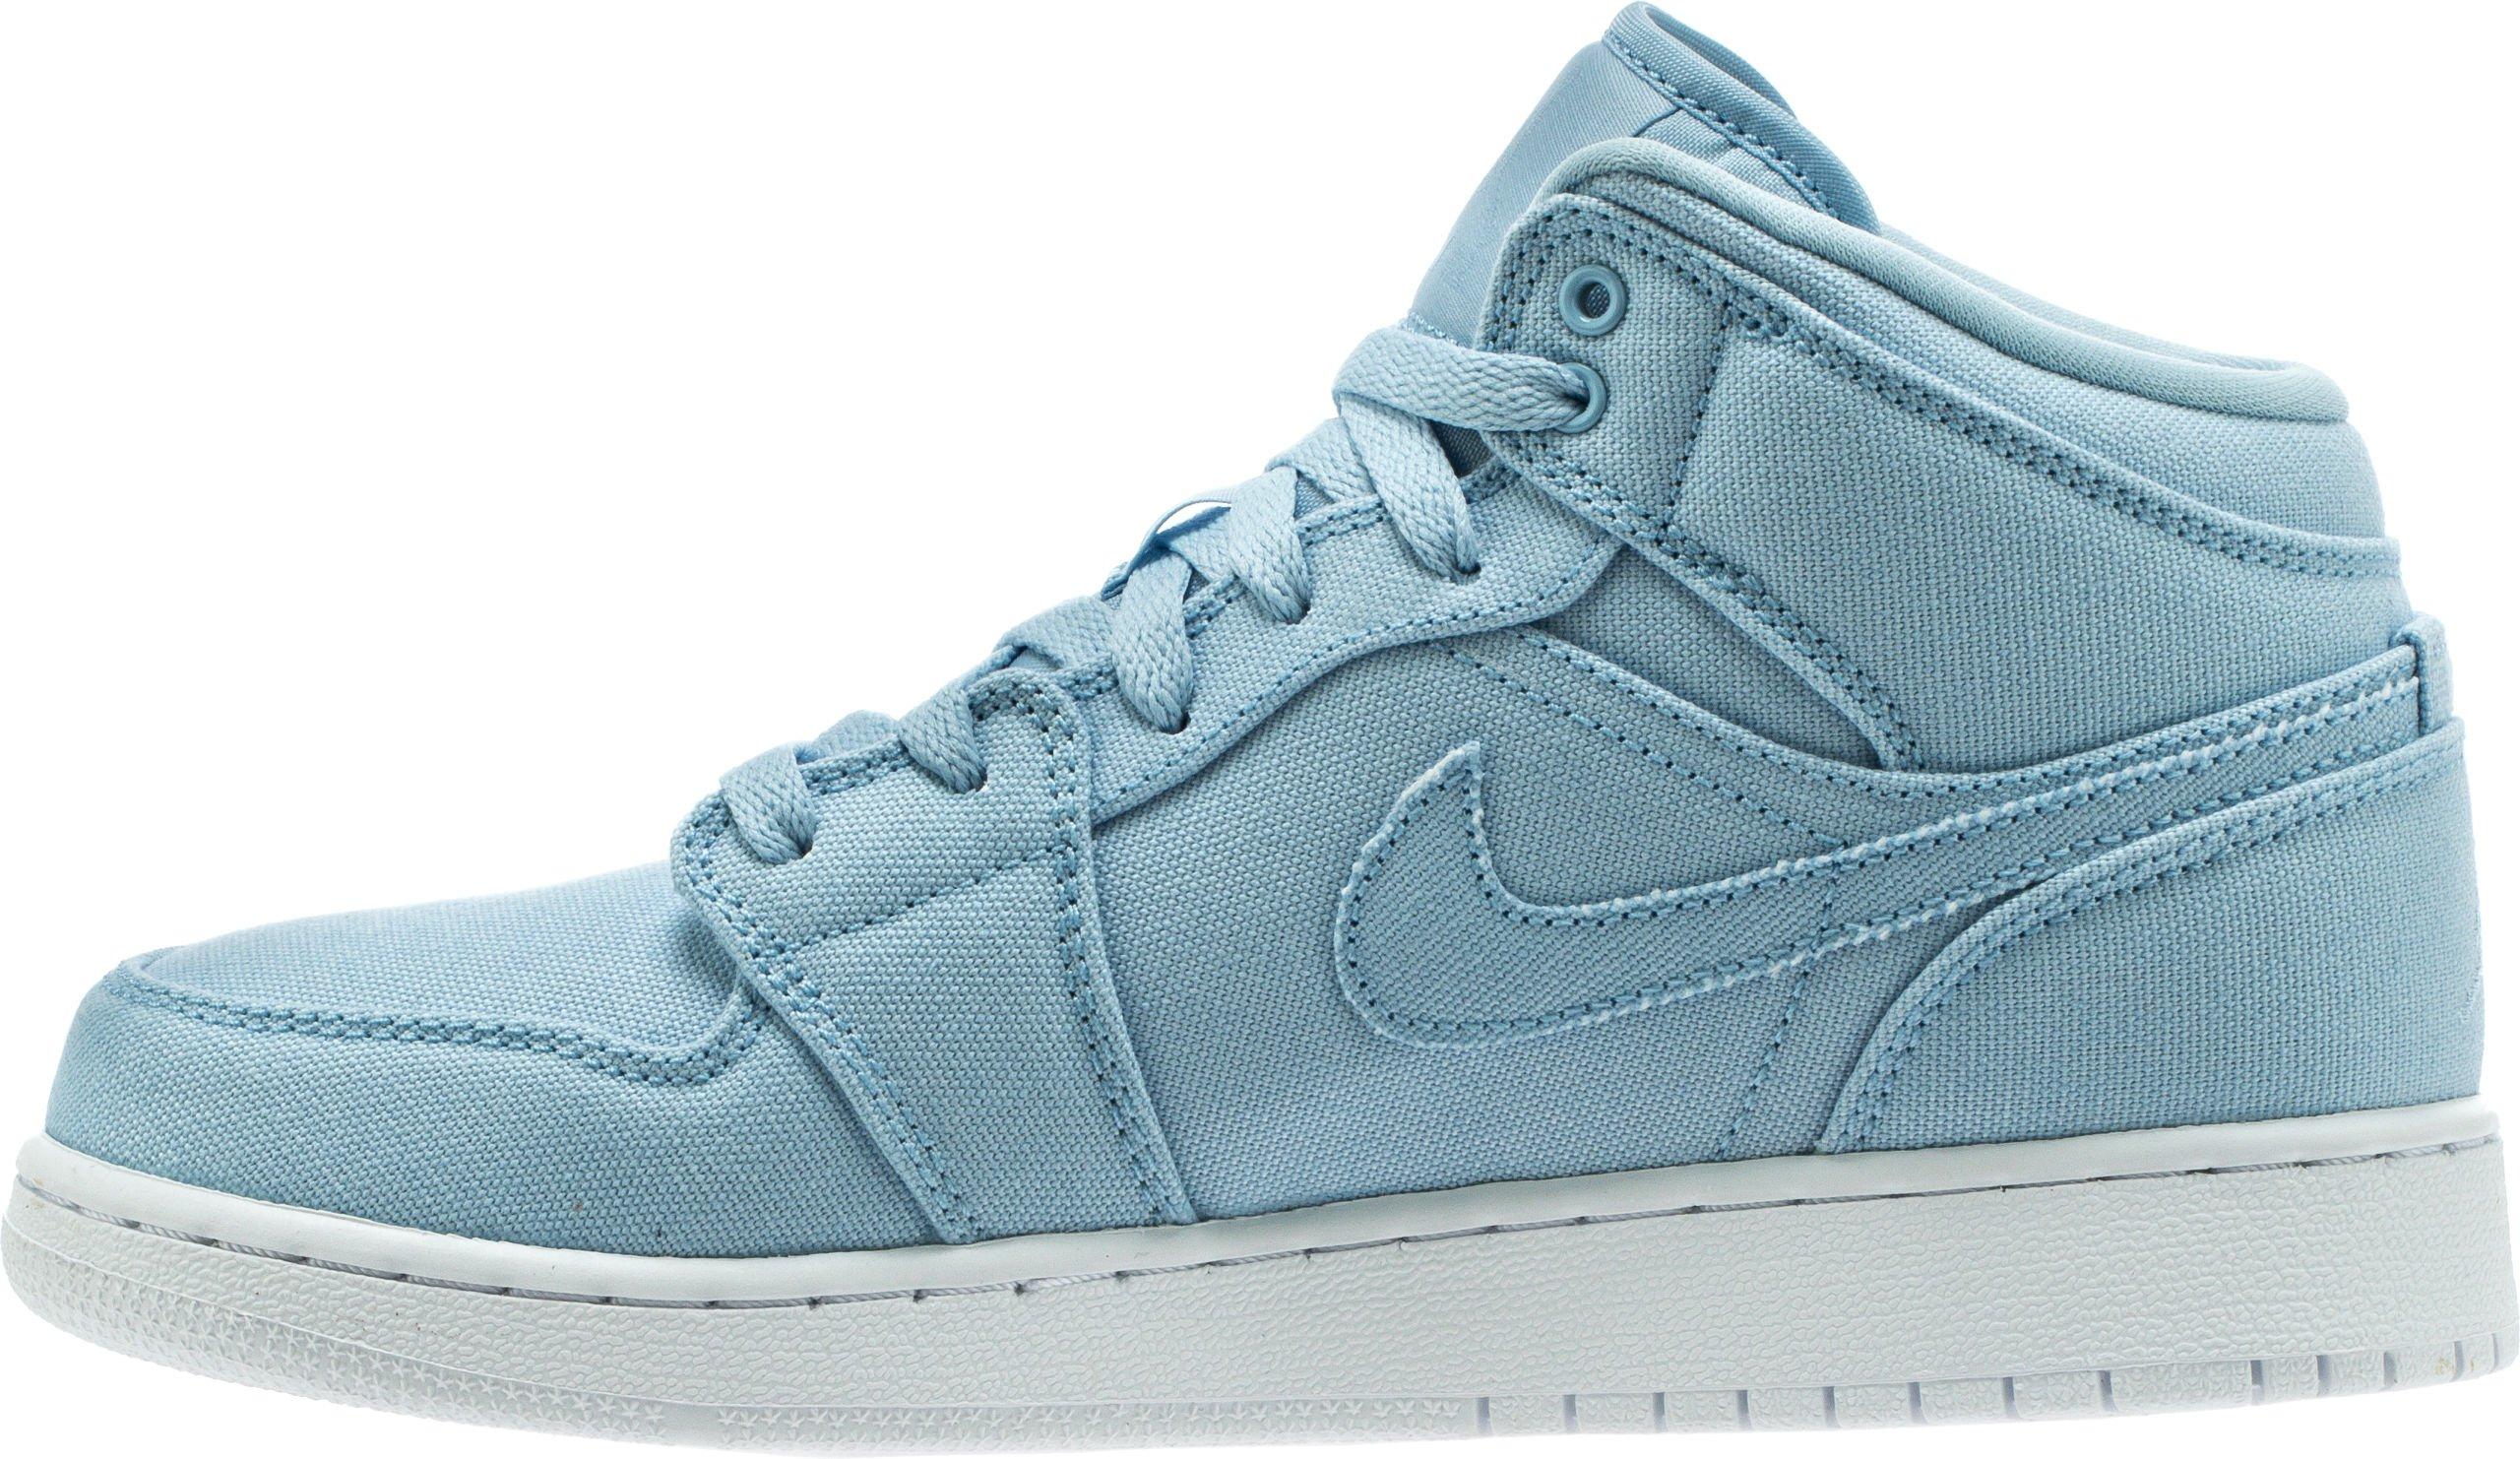 Jordan Kids Air 1 Mid BG Ice Blue White Size 6.5